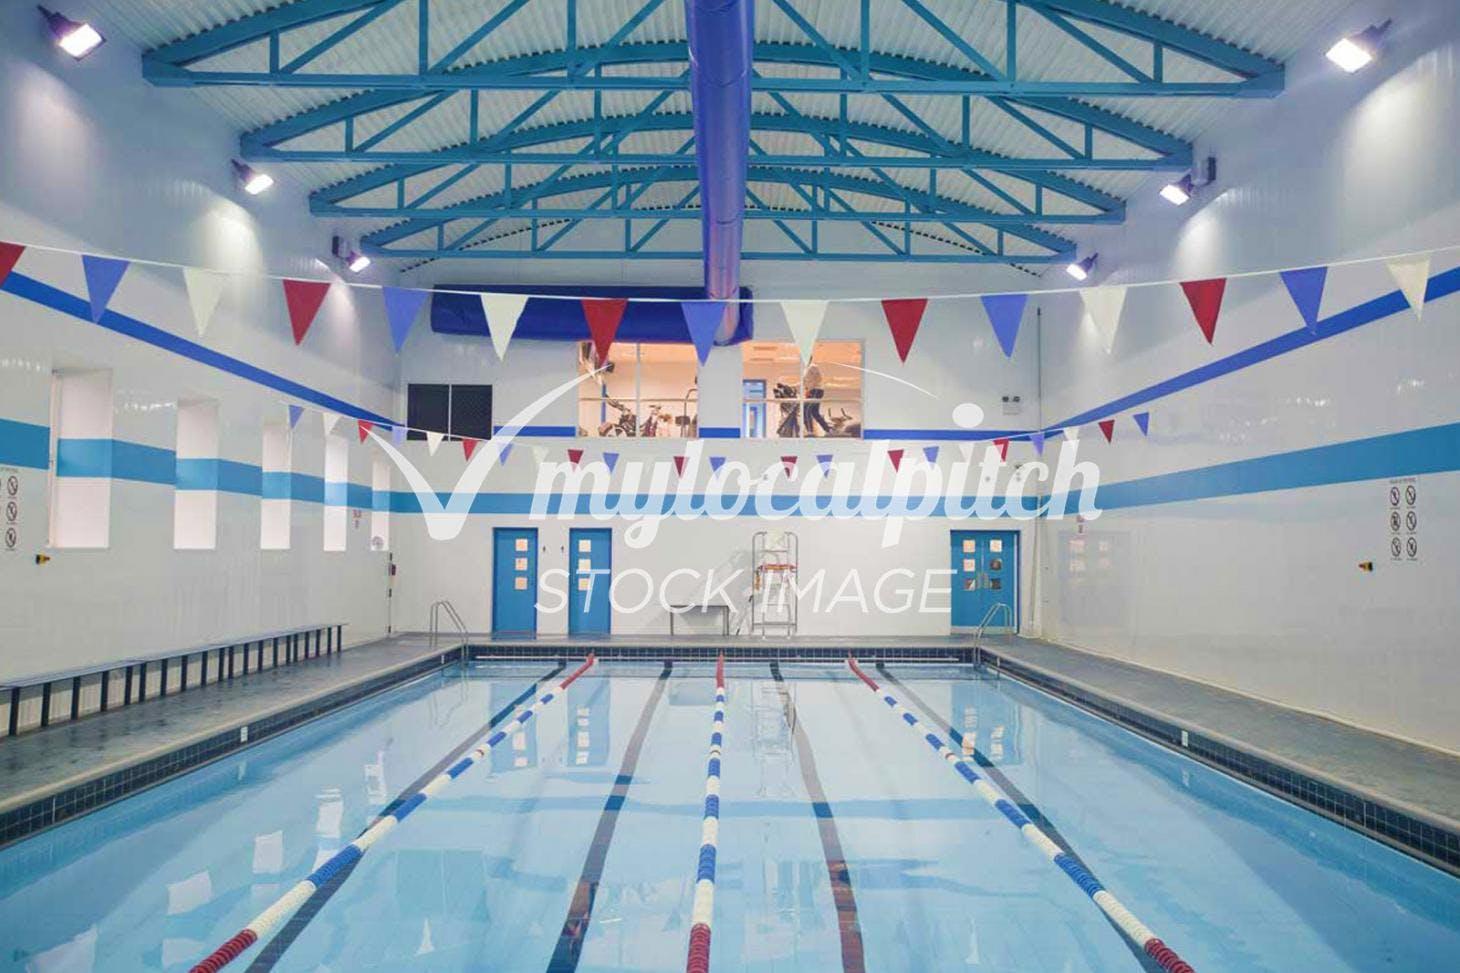 Nuffield Health Paddington Indoor swimming pool